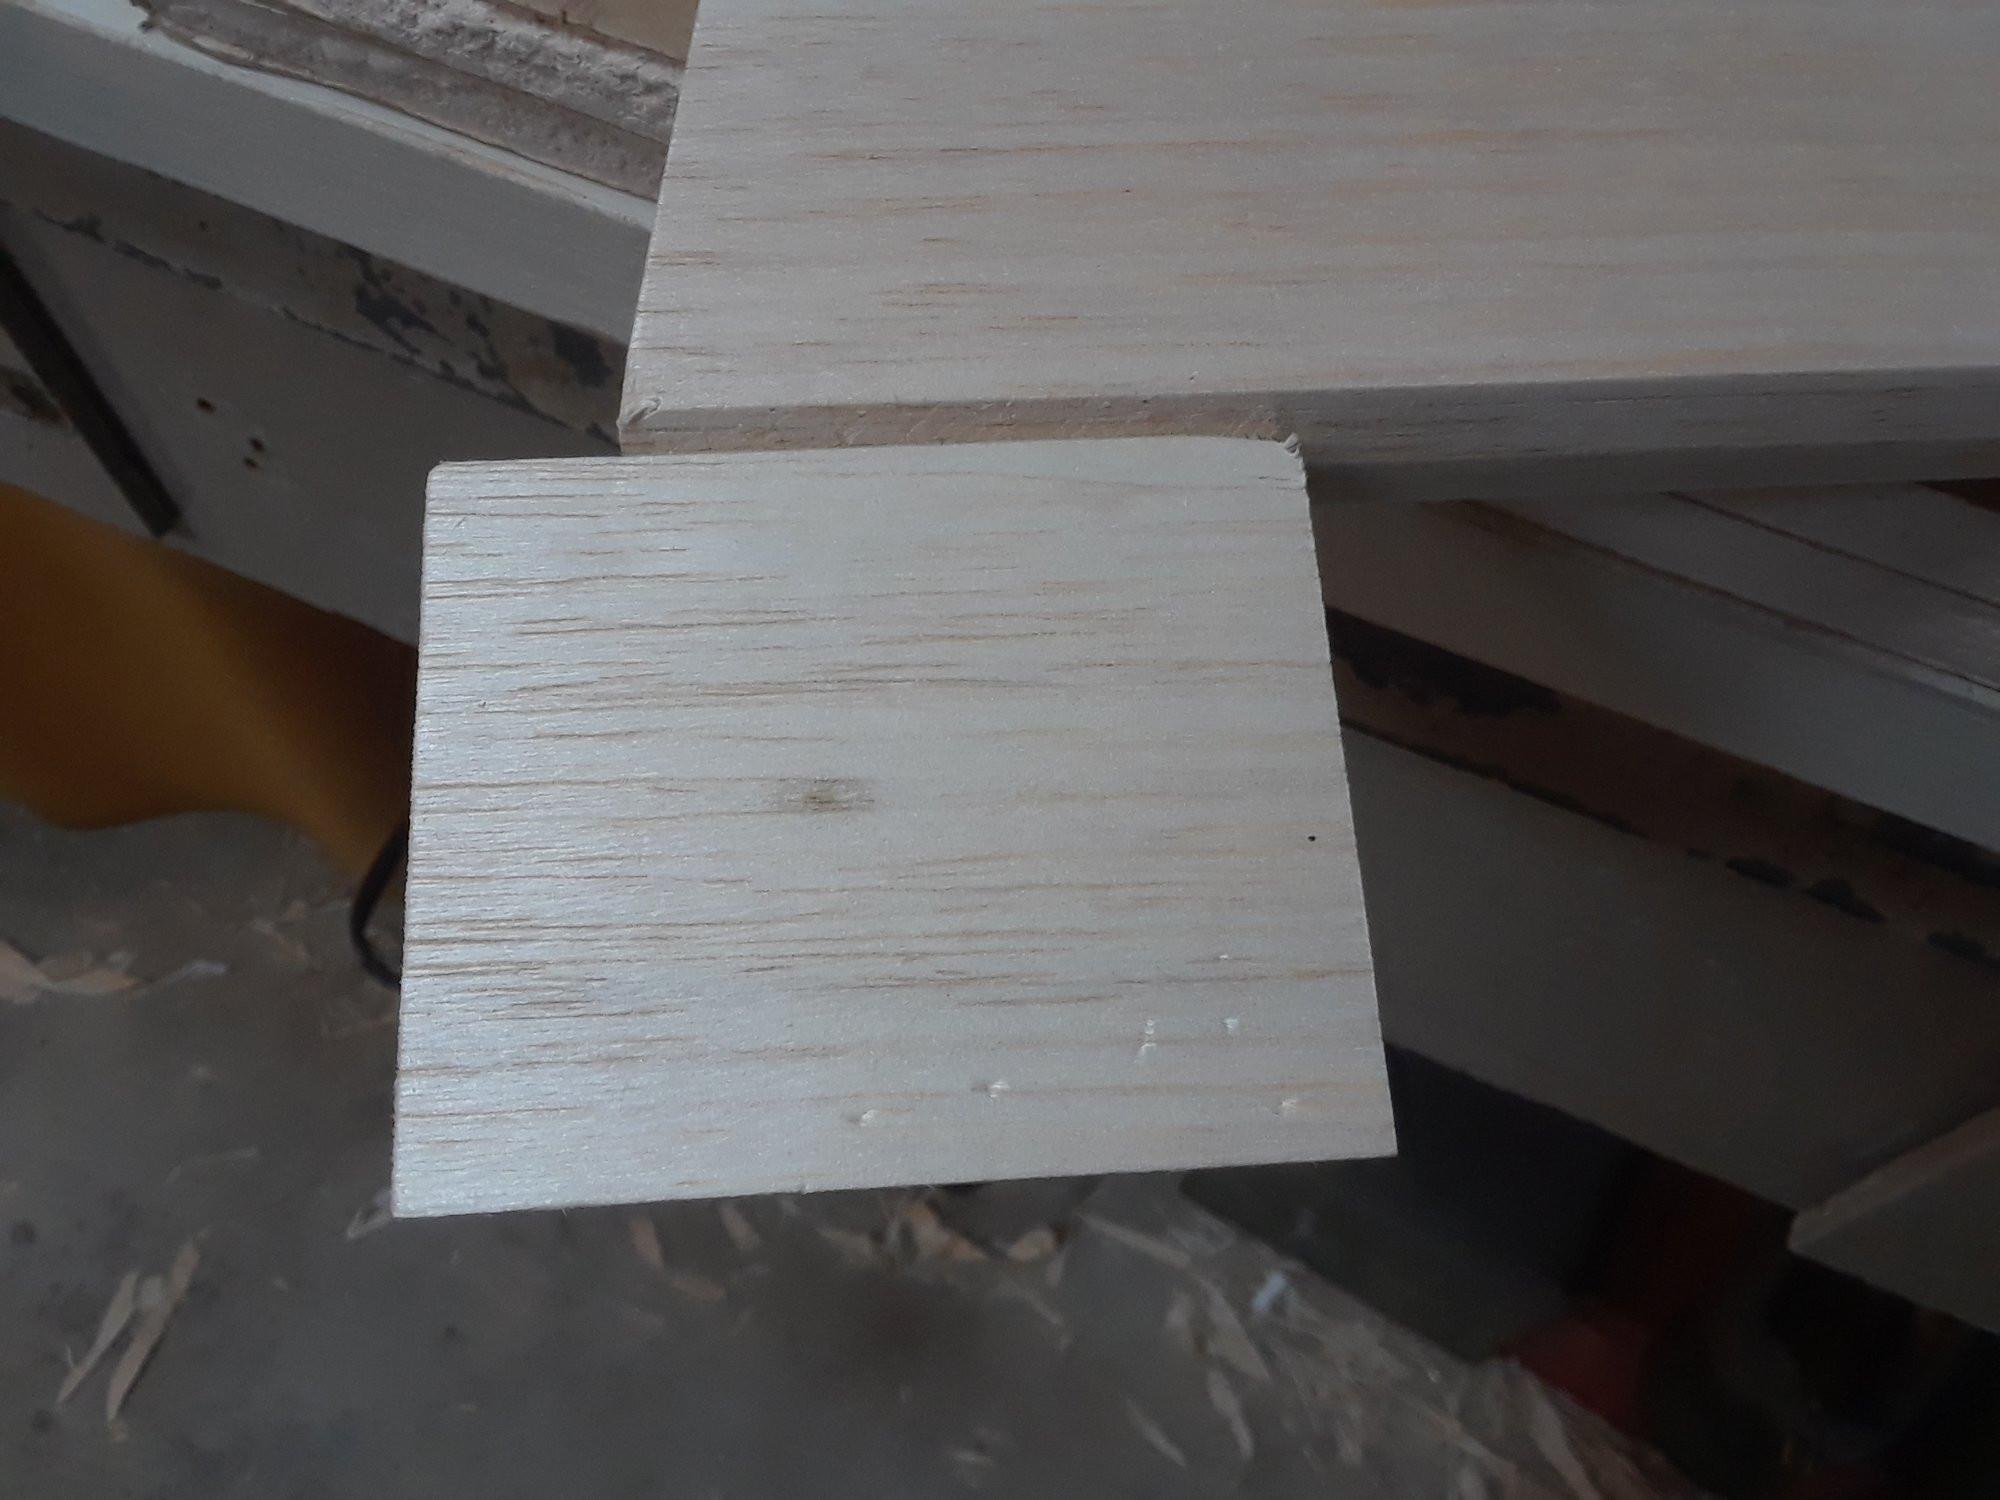 hardwood floor refinishing sacramento of reaction 54 jet kit page 158 rcu forums with regard to cars ii 04 18 2018 0435 pm